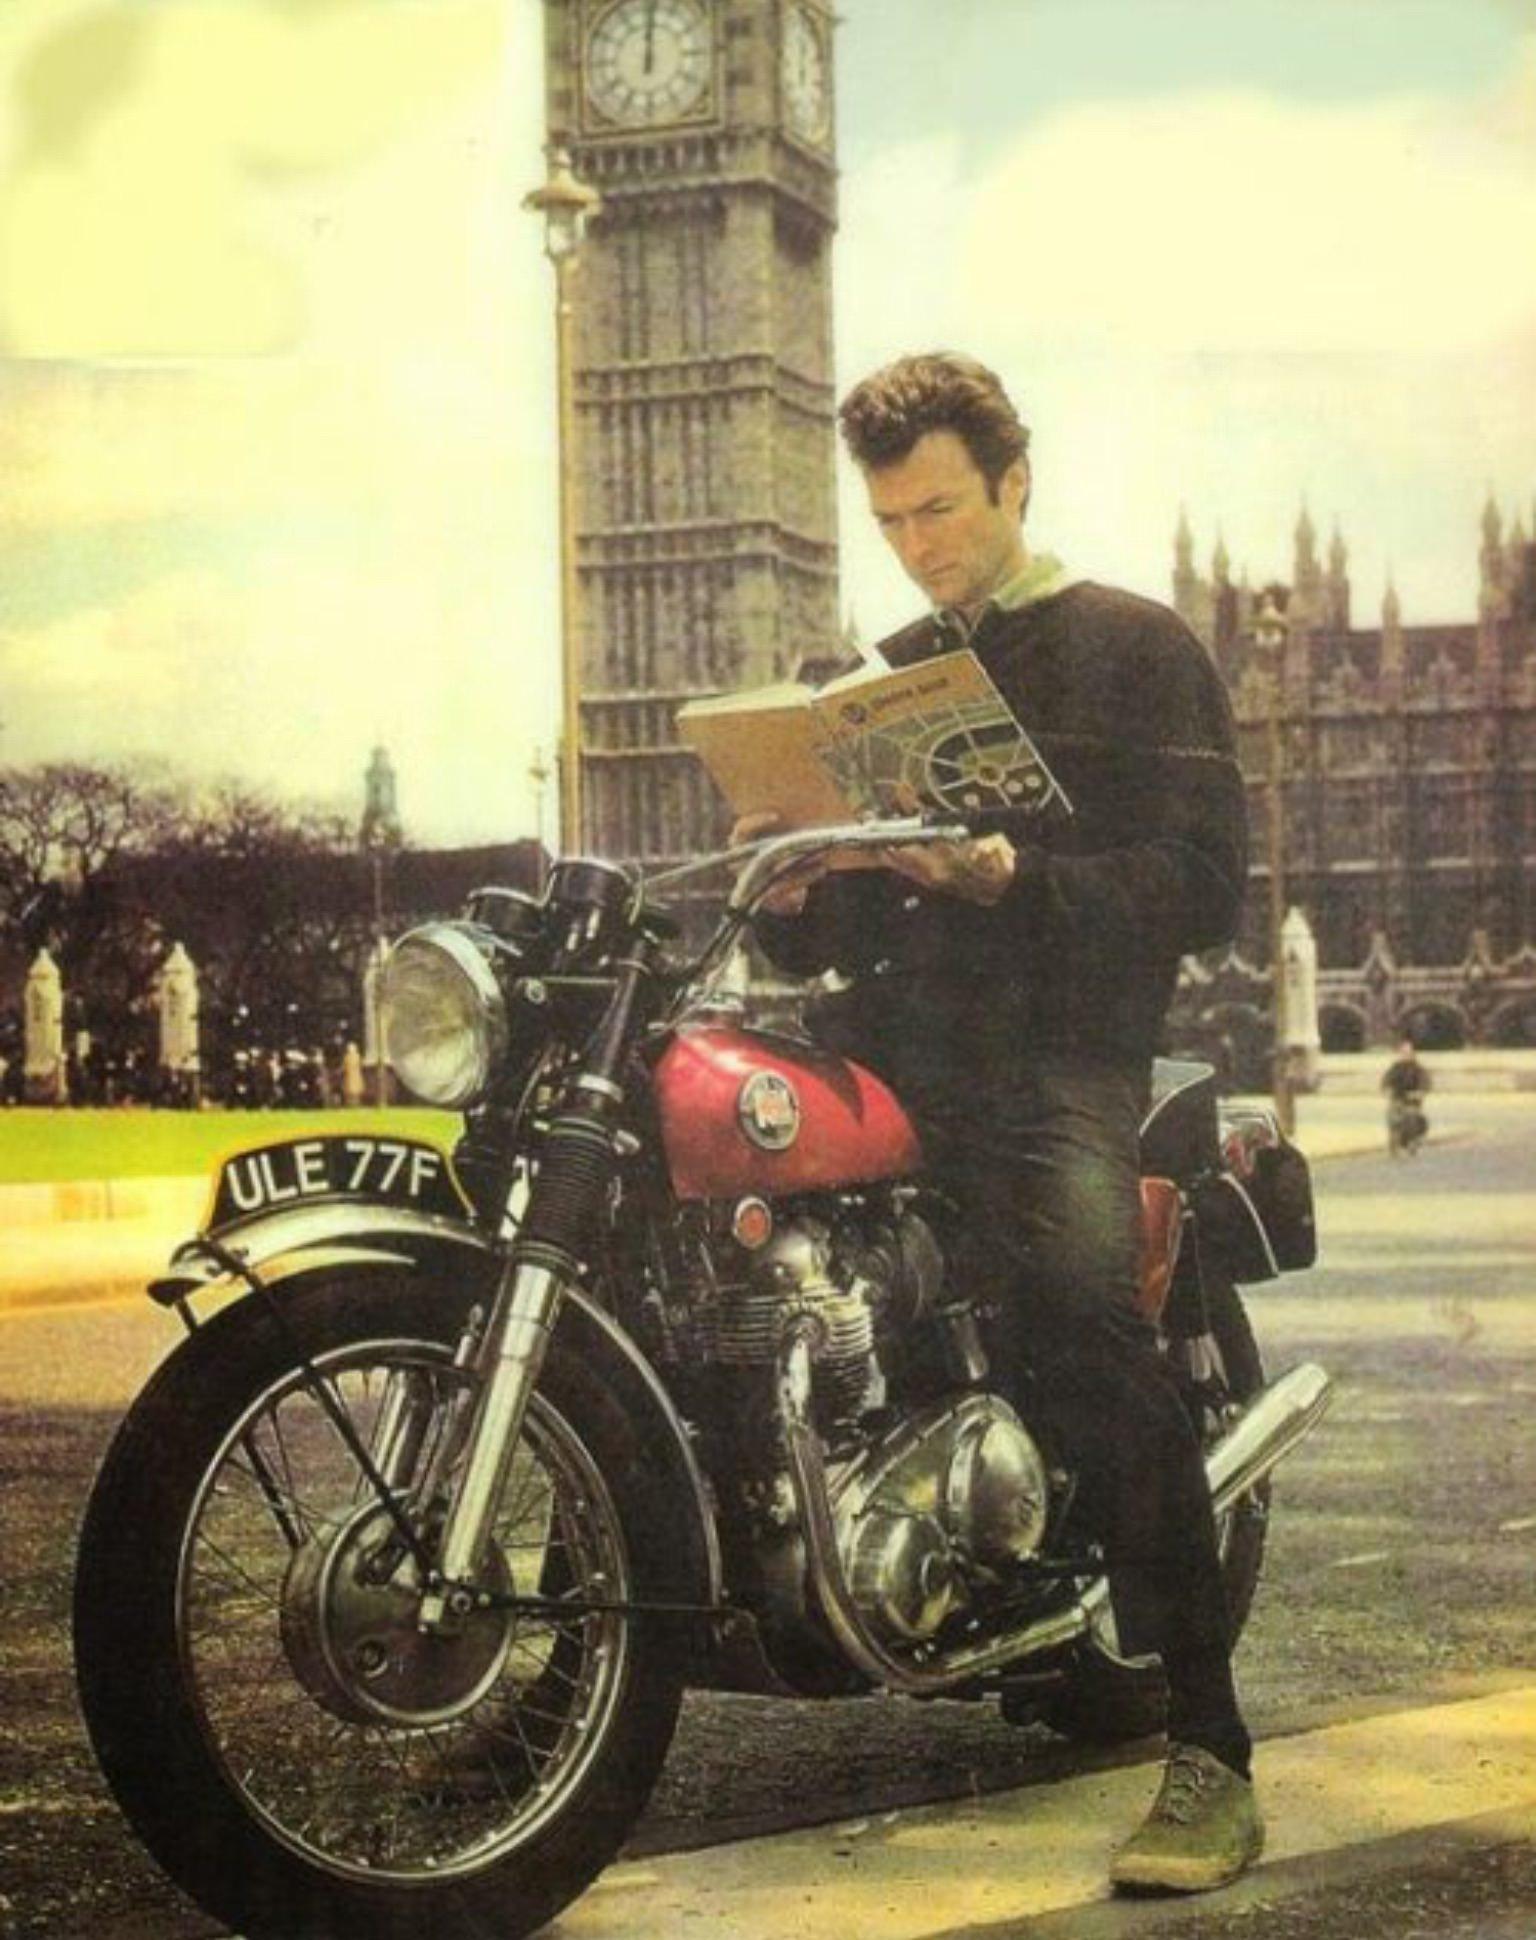 Clint-Eastwood-Norton-P11-Motorcycle-Lon